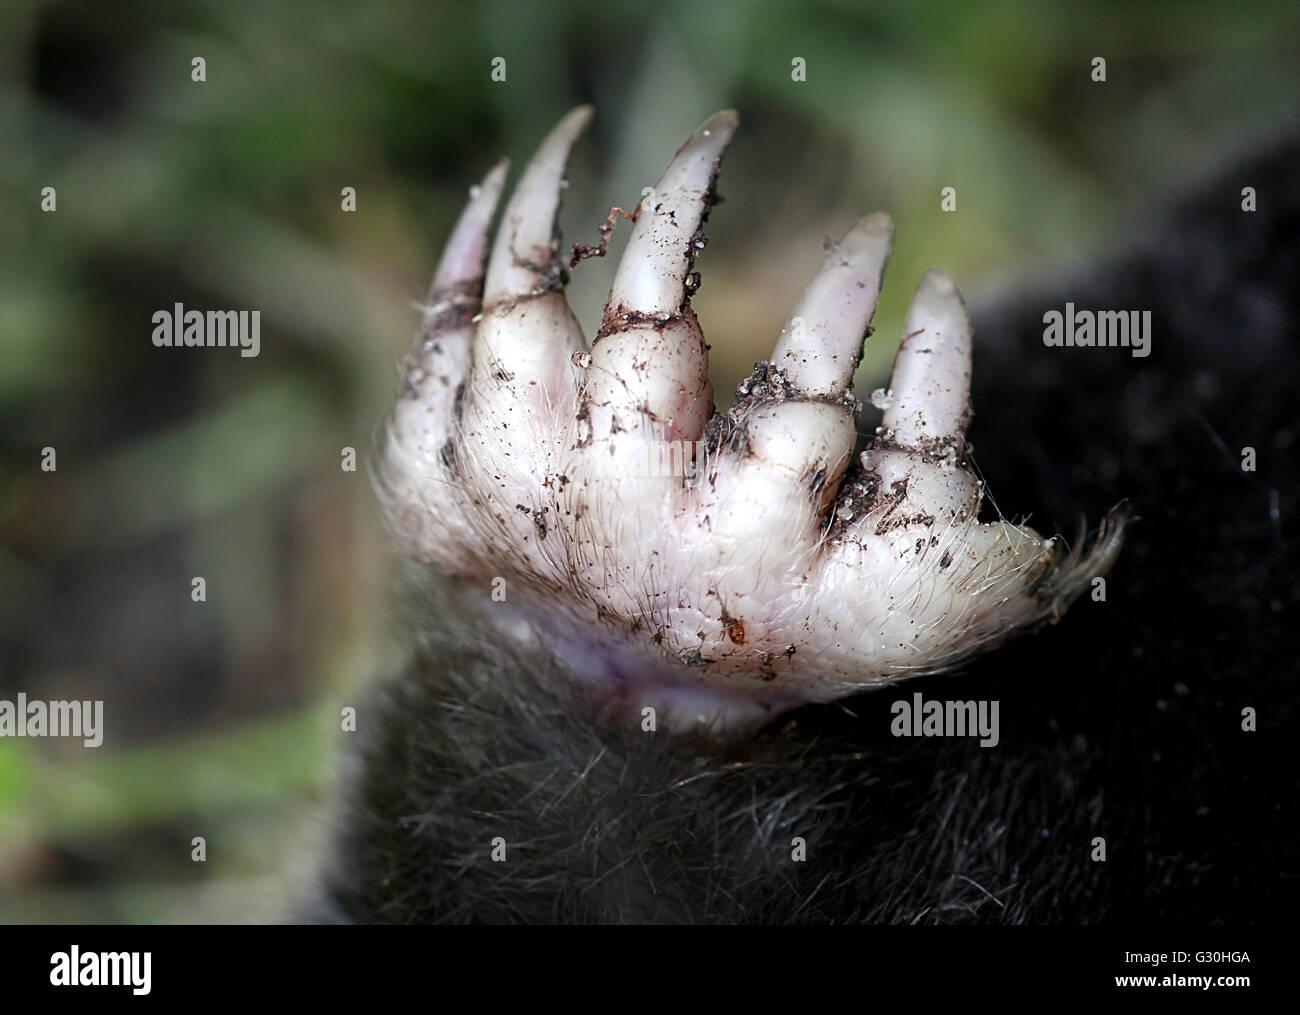 European mole (Talpa europaea), closeup of the right  front claw and sharp nails - Stock Image